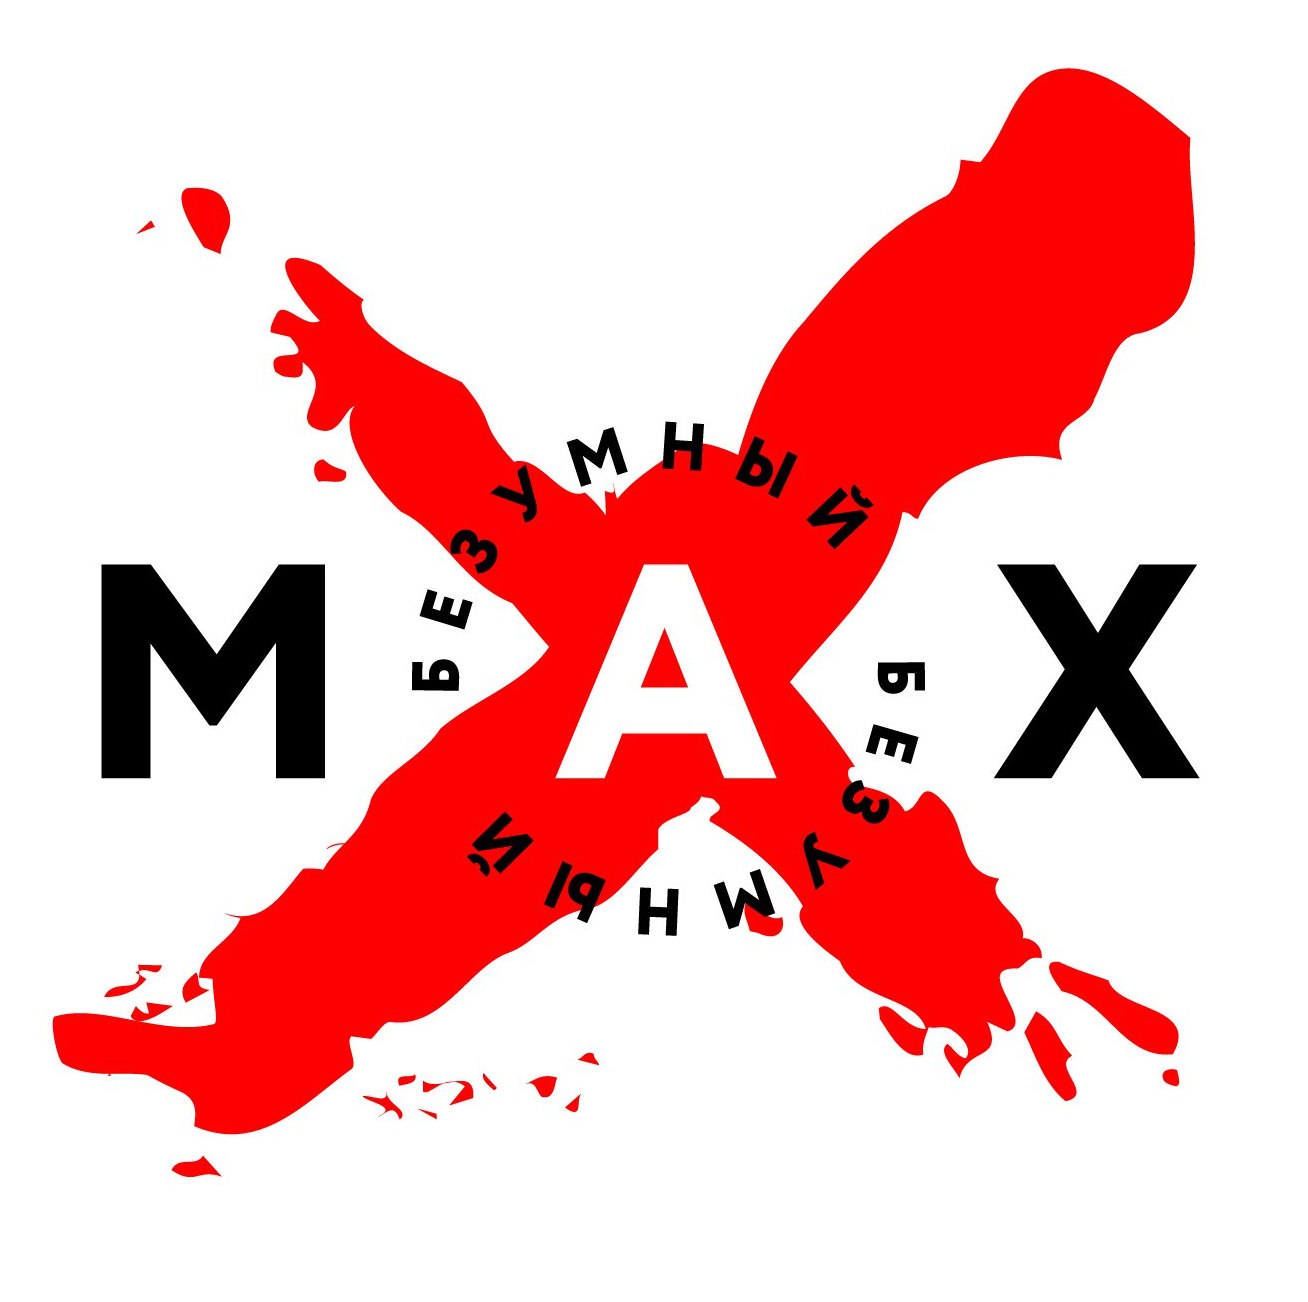 Логотип площадки Mad Max Bar